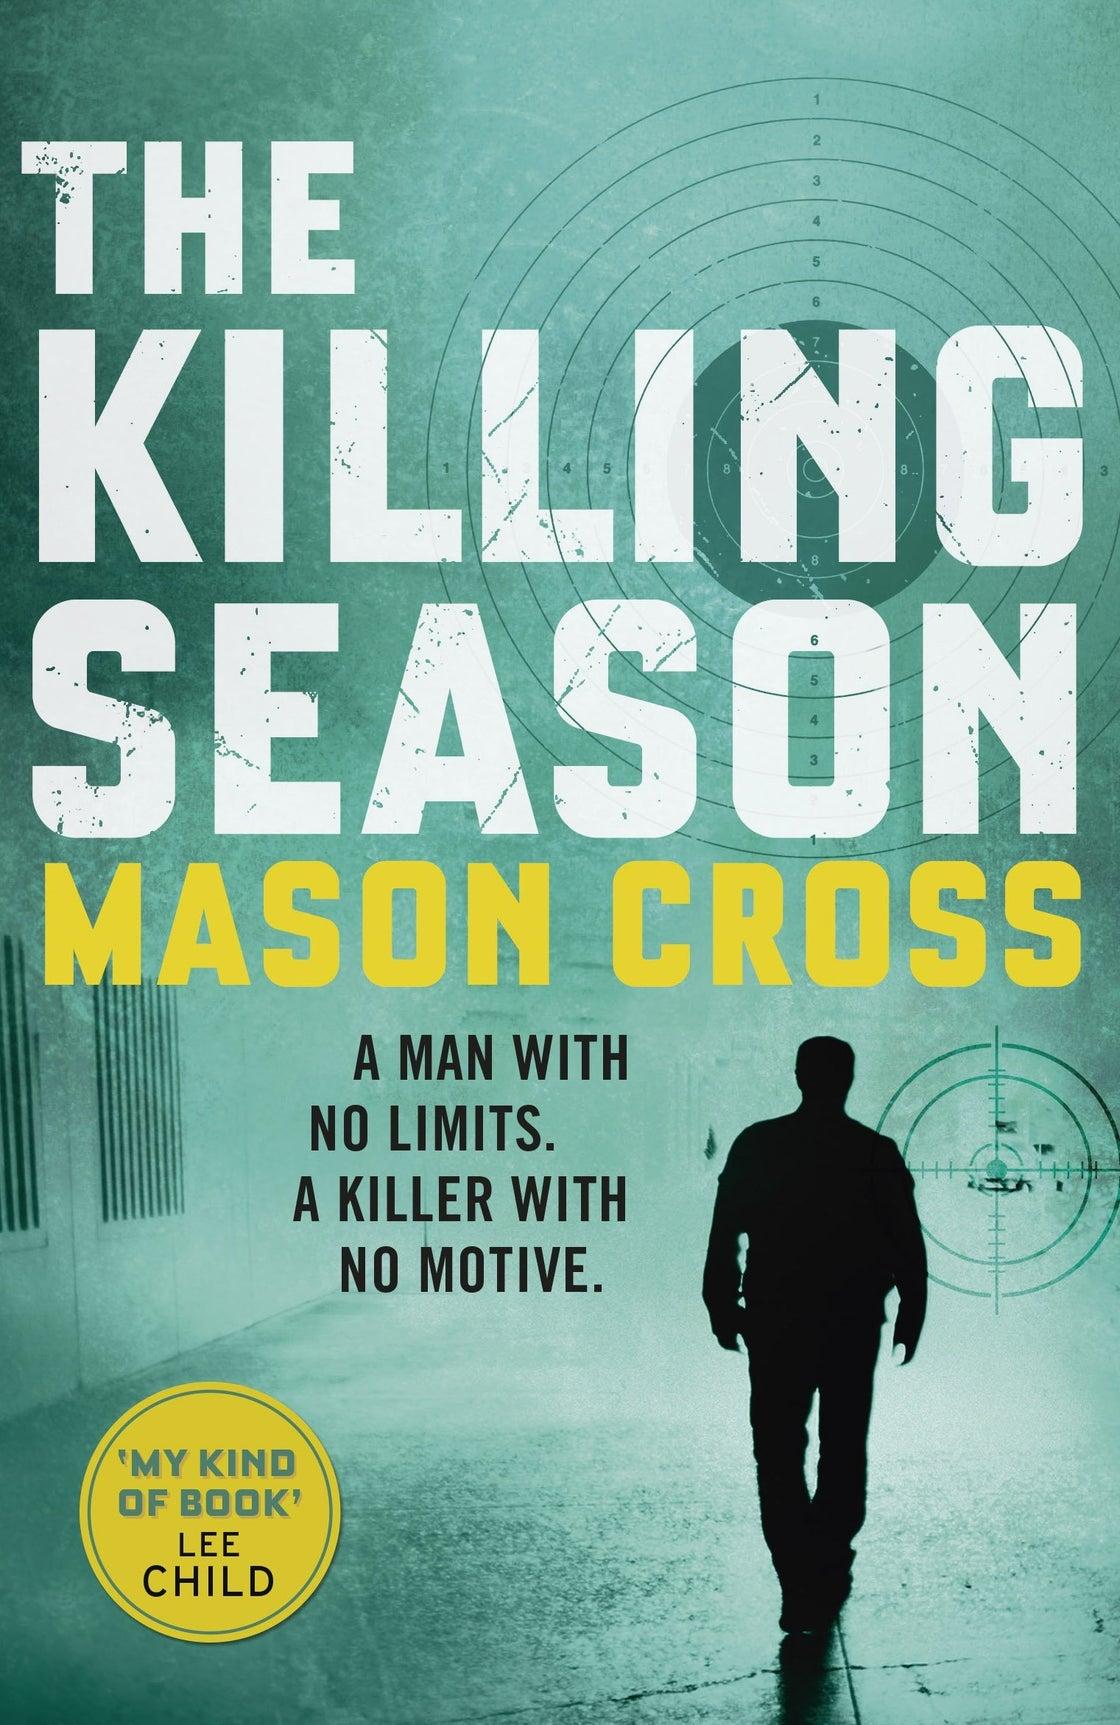 Image of The Killing Season - UK mass-market paperback signed by the author